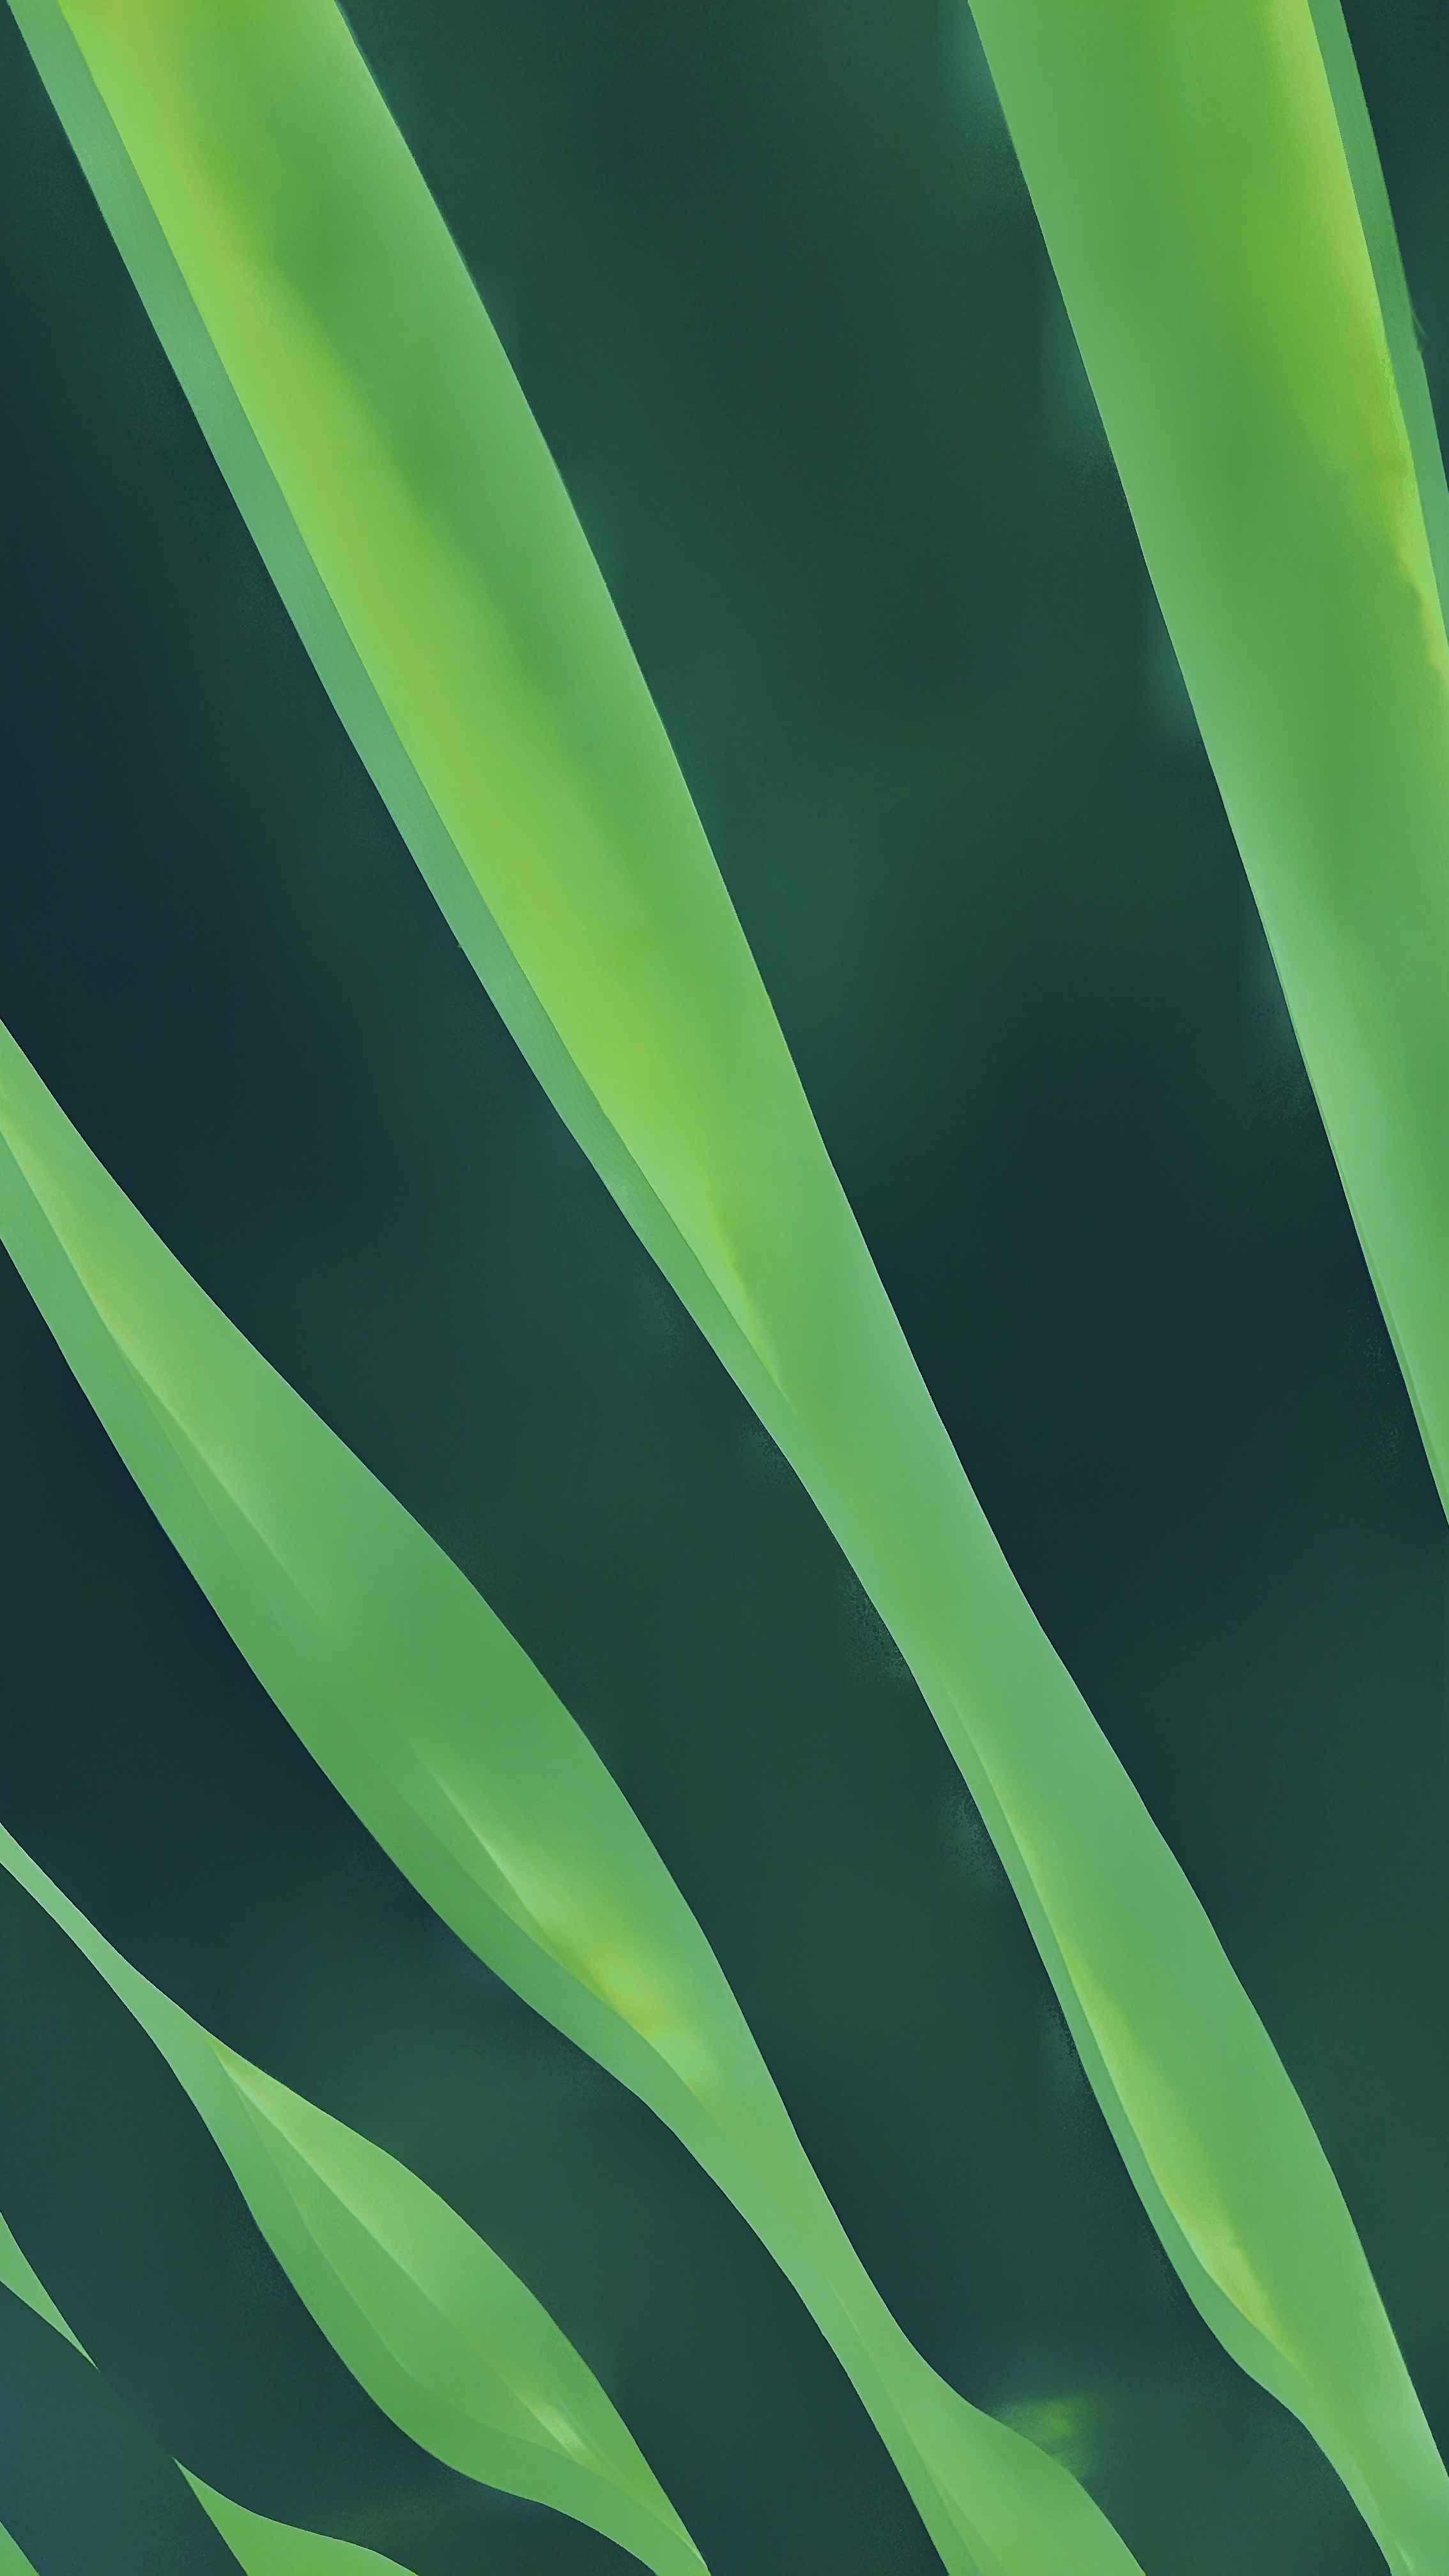 Green Wave iPhone Wallpaper